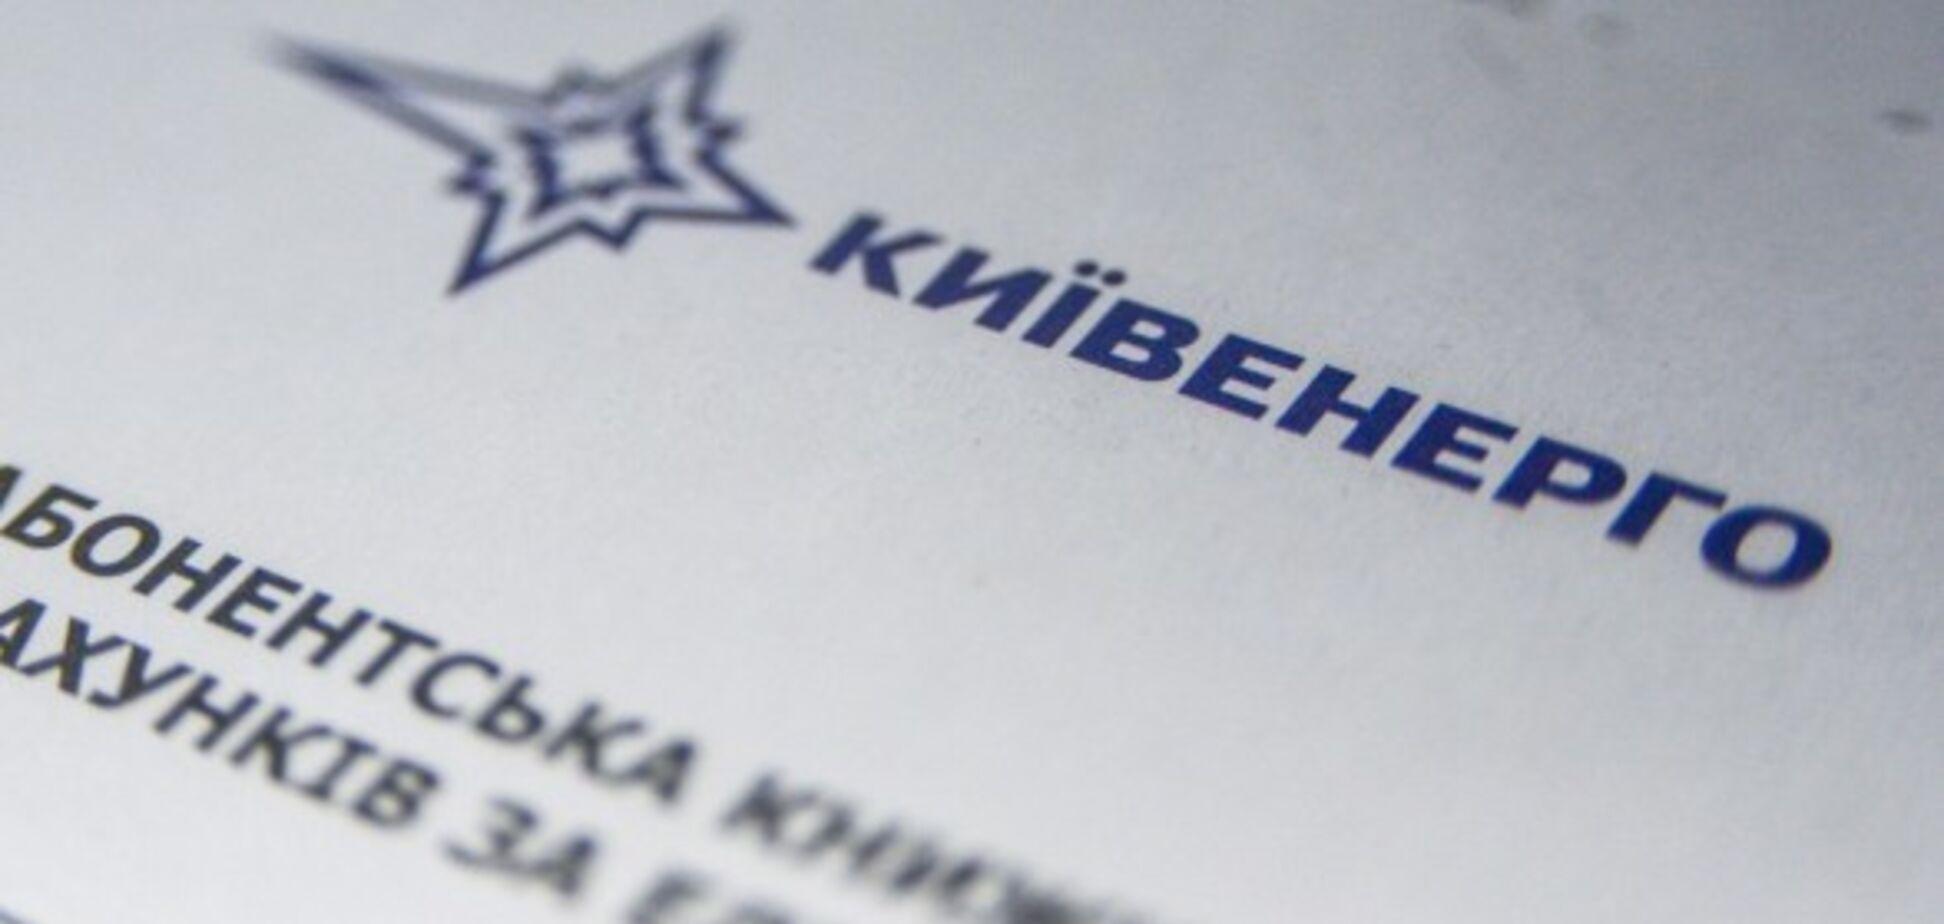 ''Київенерго'' оштрафували на сотні тисяч: названа причина